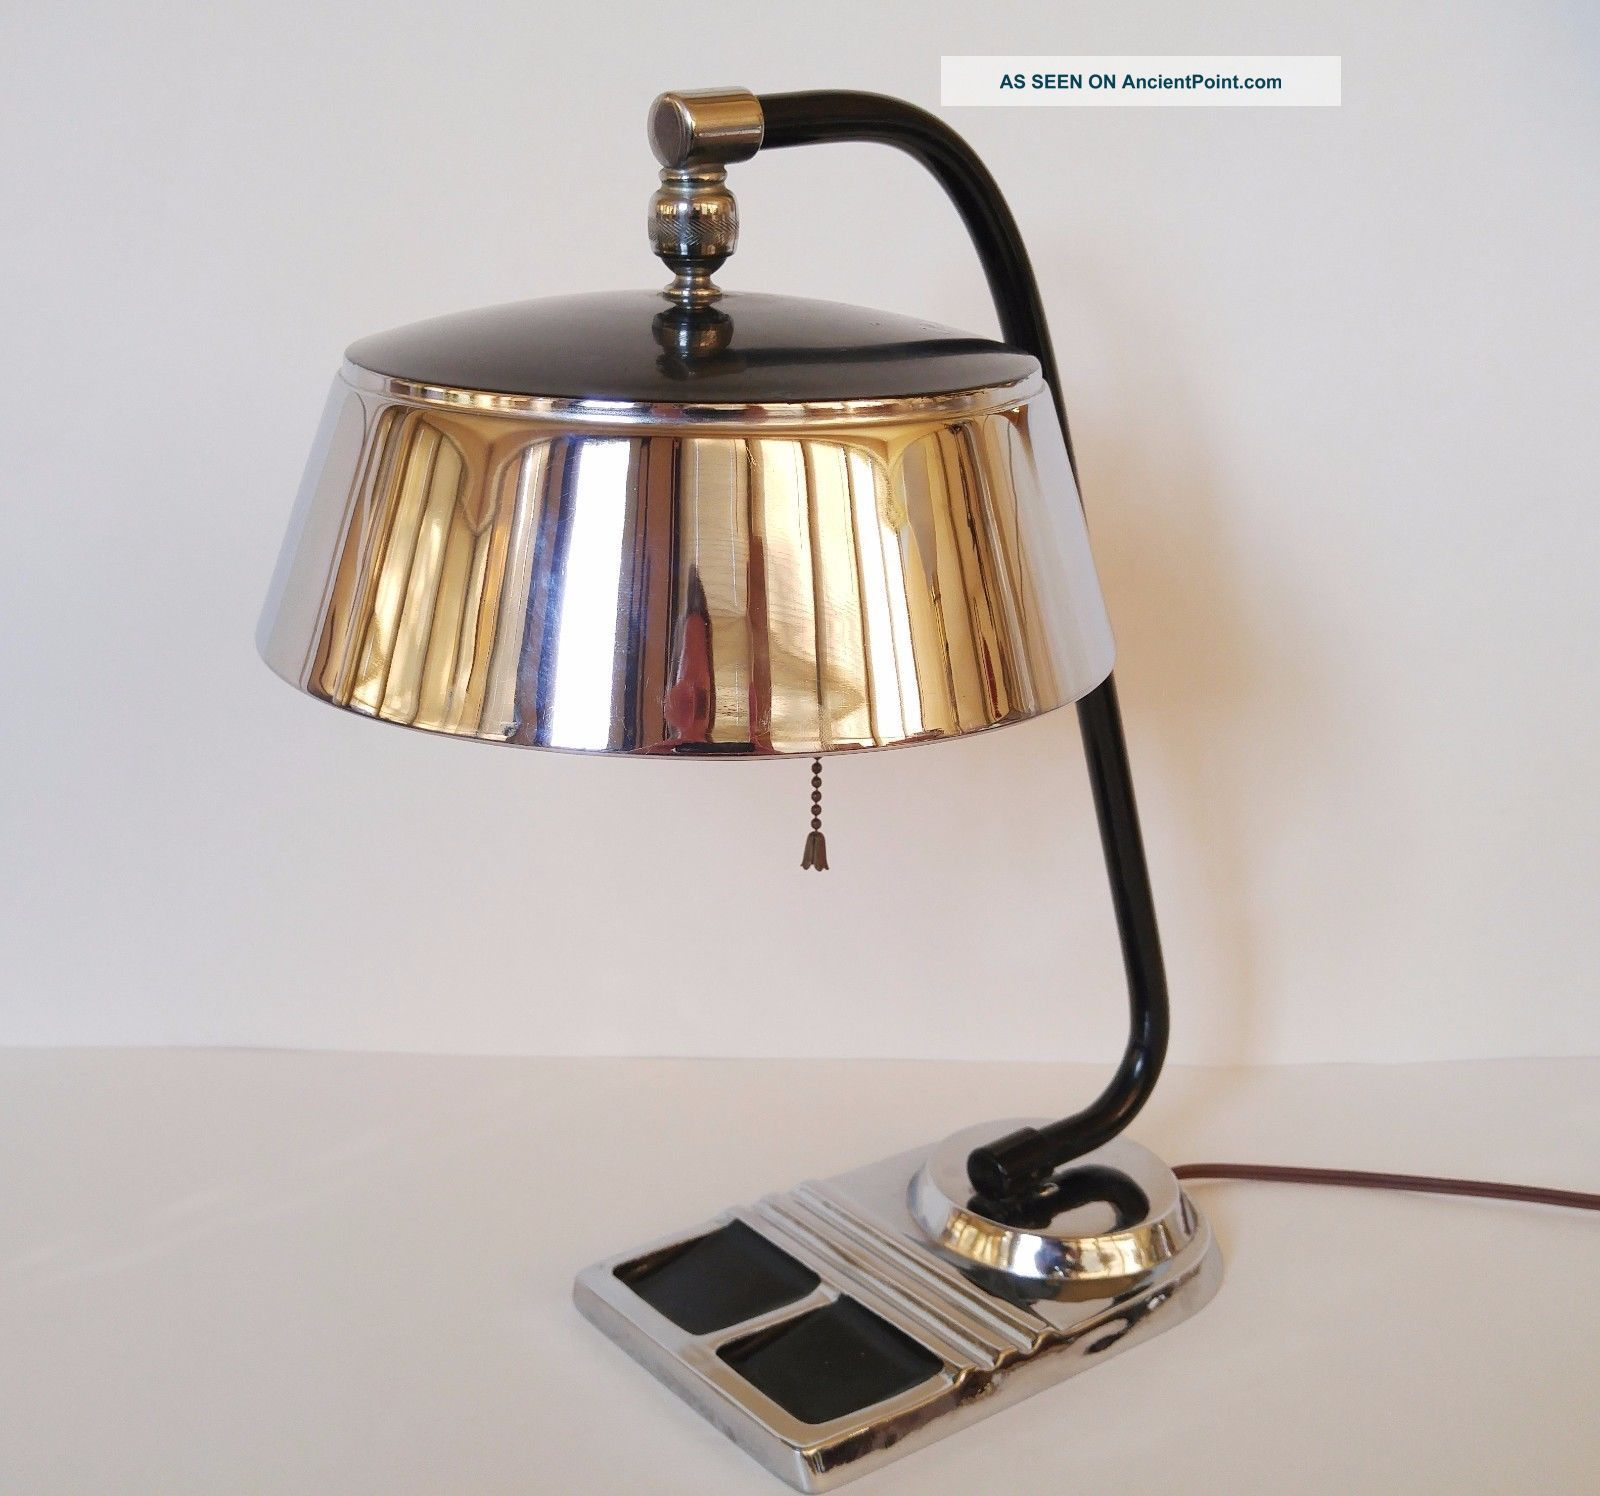 Art Deco Machine Age Chrome Desk Lamp Kurt Versen Gilbert Rohde Chase Markel Era Art Deco photo